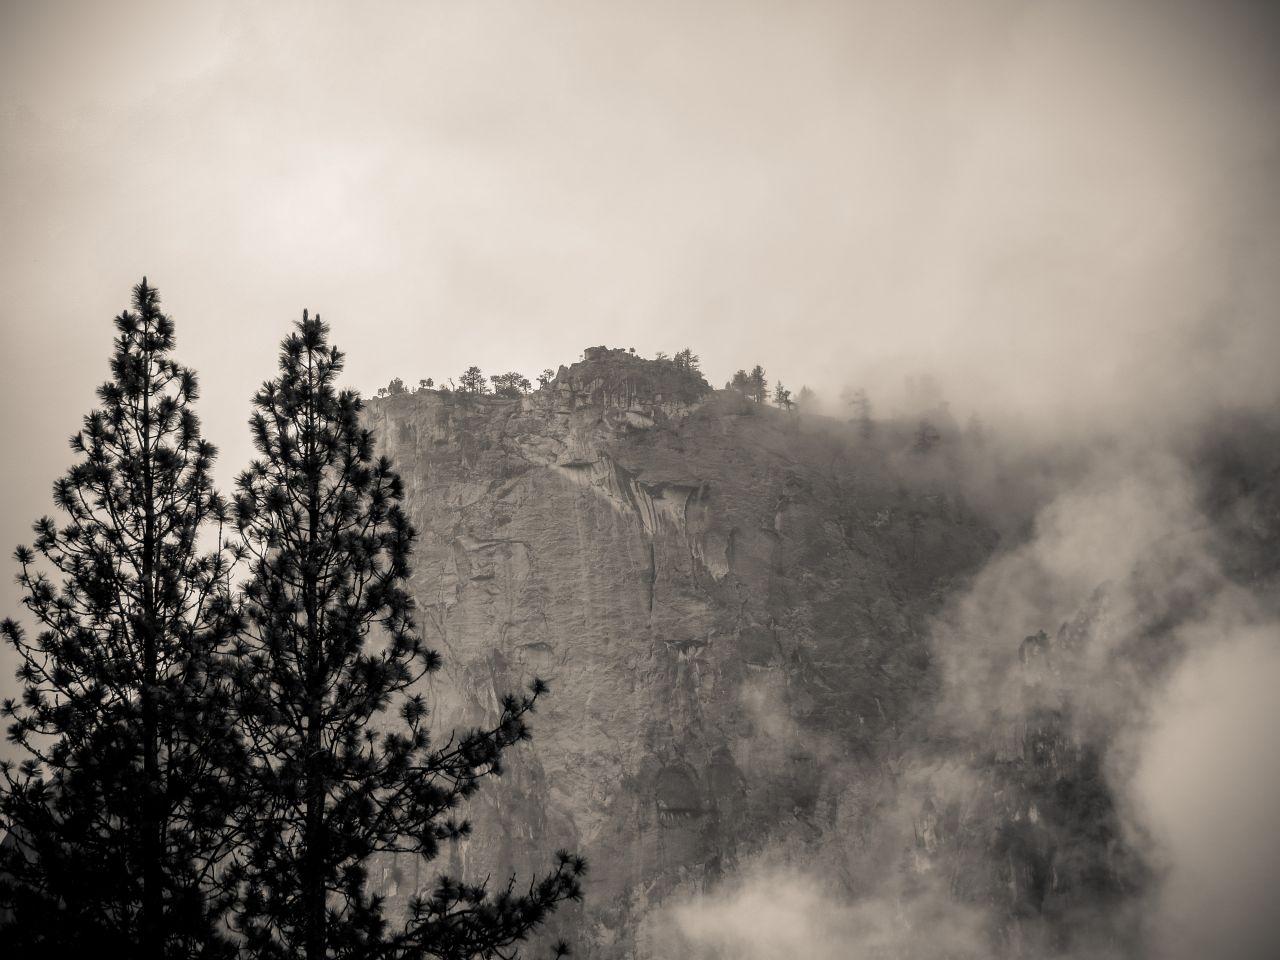 Йосемити парк. Долина Йосемити